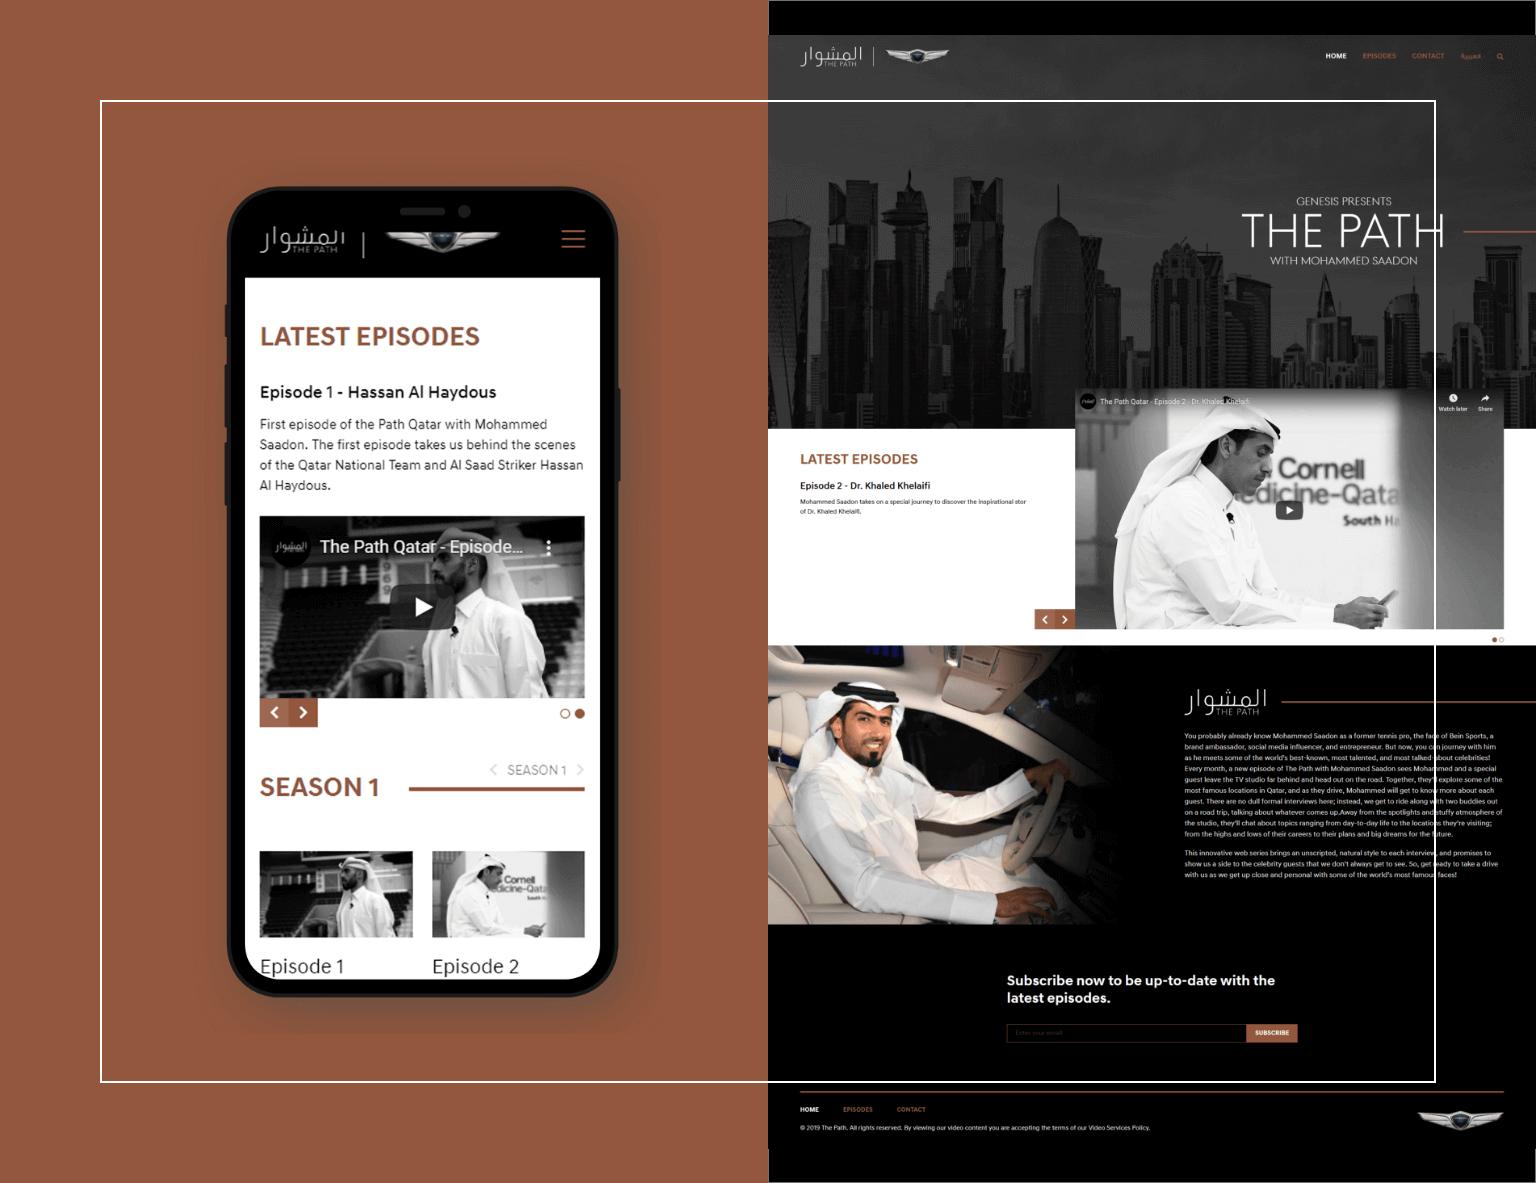 The Path Qatar